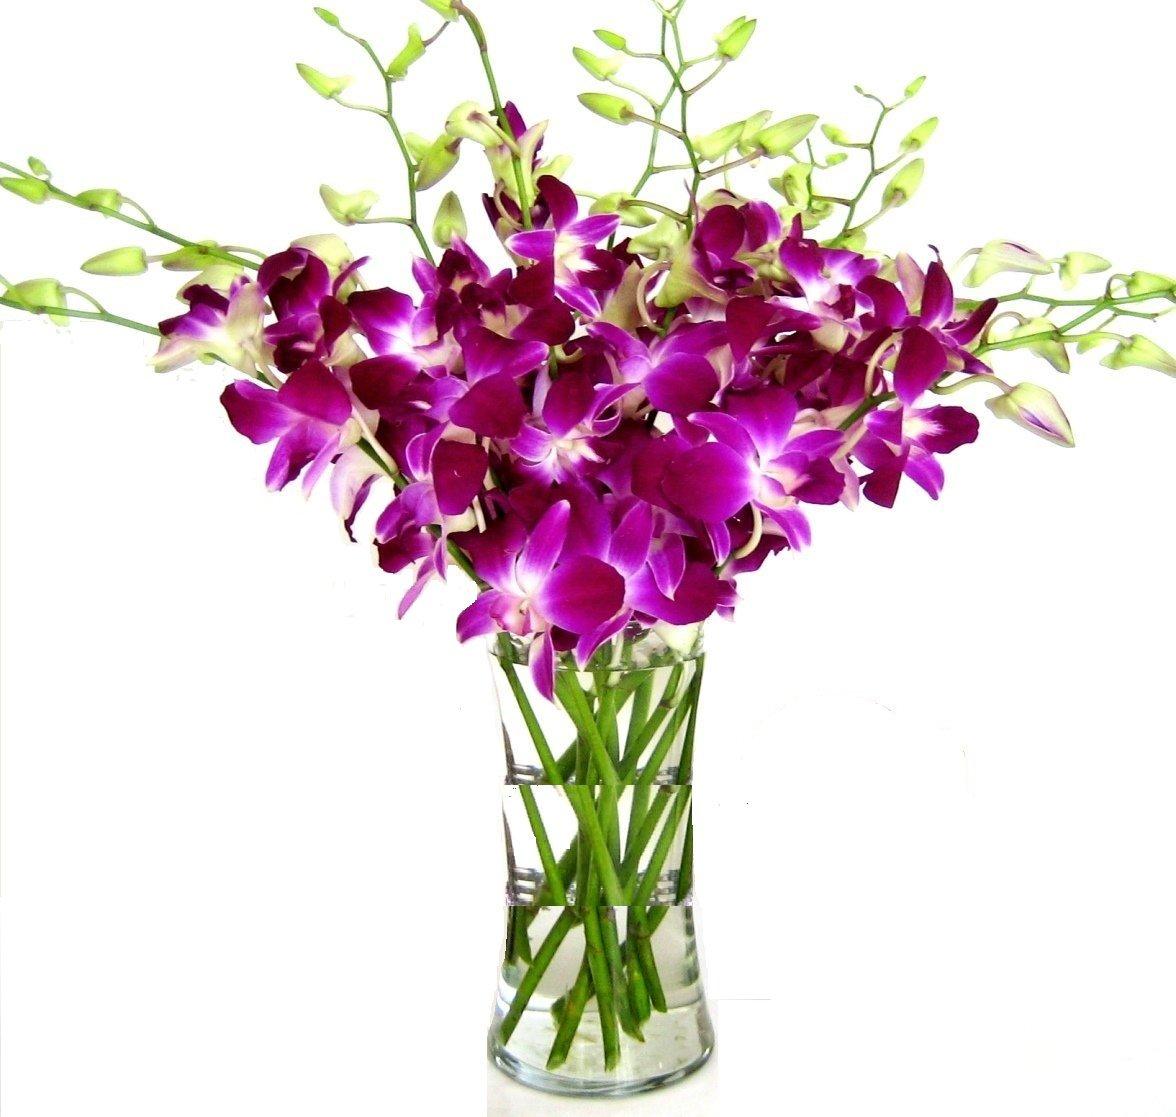 Fresh Cut Flowers -Dendrobium Purple Orchids with Vase by eflowerwholesale